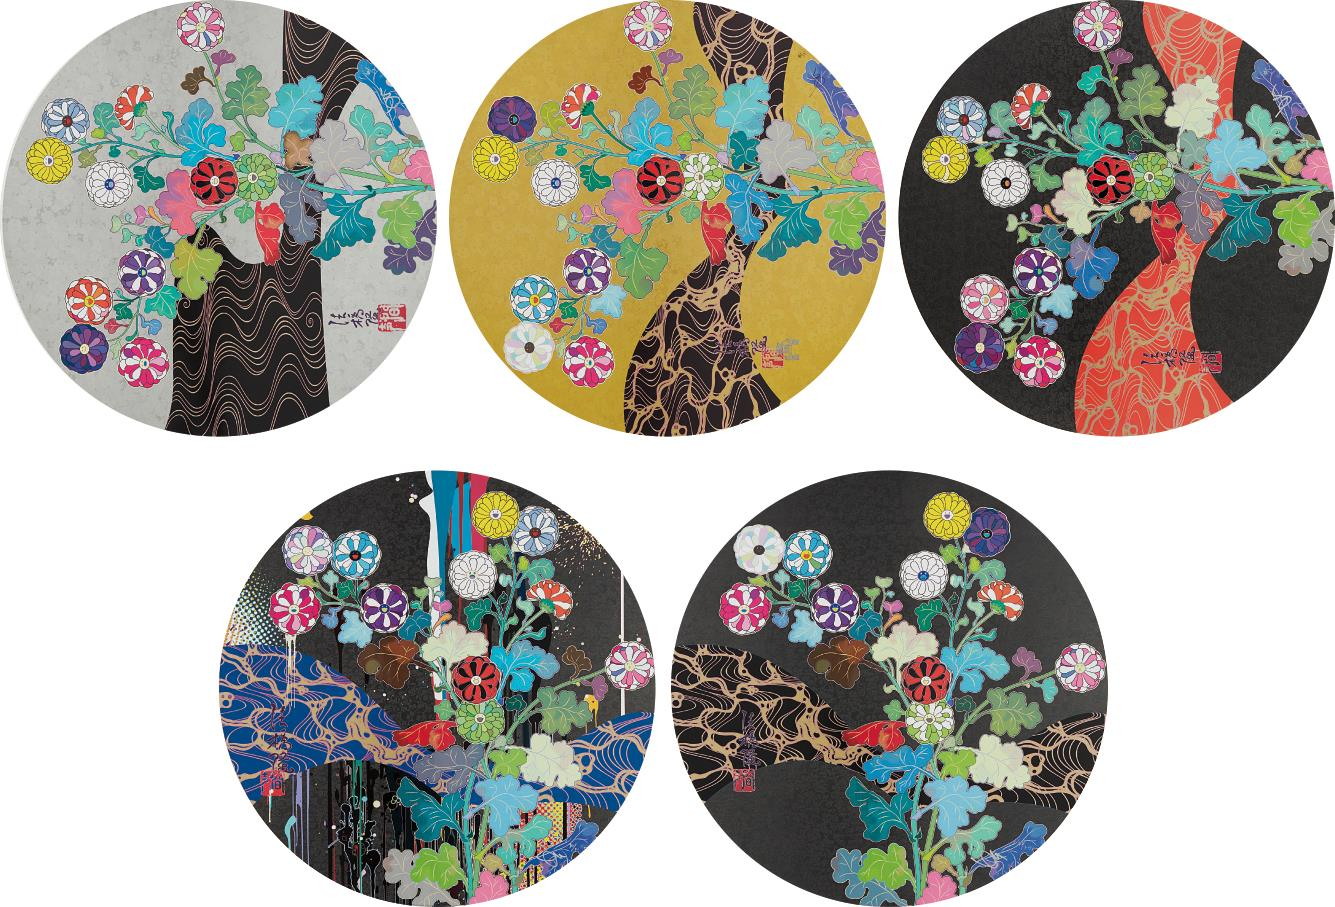 Takashi Murakami-A Red River Is Visible; Kansei: The Golden Age; Hokkyo Takashi - Kansei; Kansei: Wildflowers Glowing In The Night; And Korin: Stellar River In The Heavens-2015